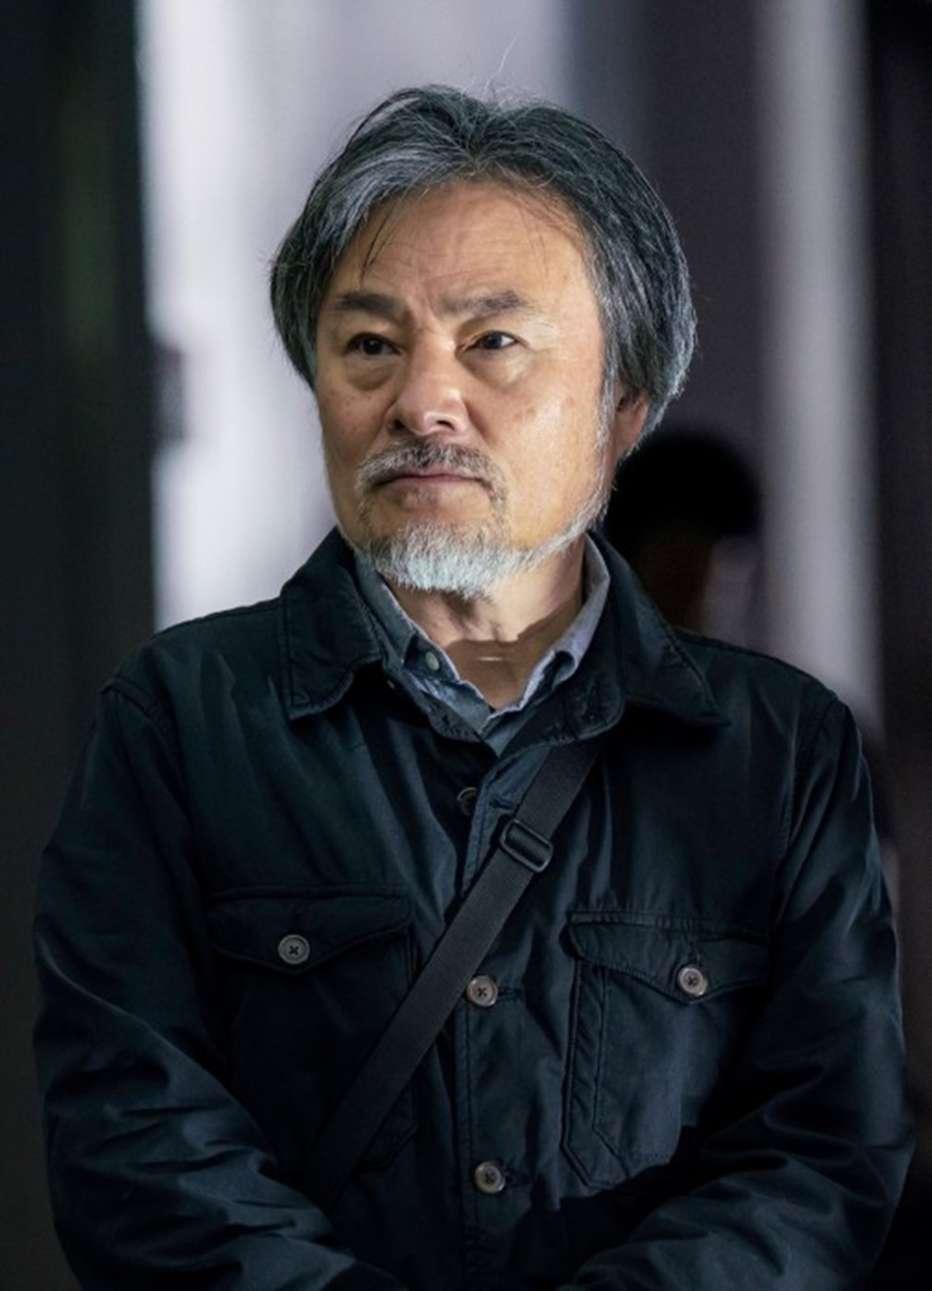 Foreboding-2018-Kiyoshi-Kurosawa-004.jpg